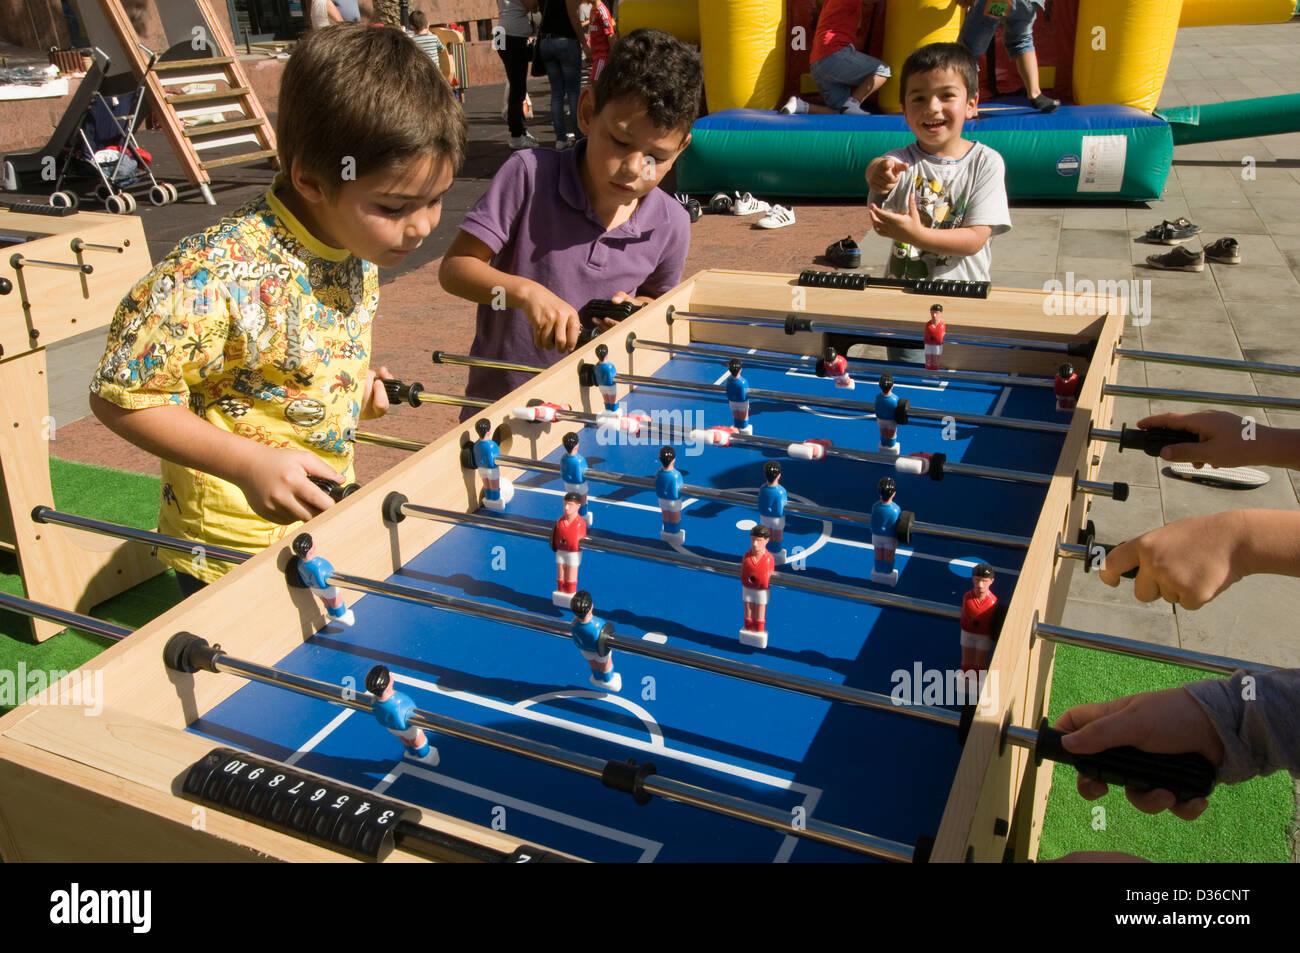 tablefootball table football children kids playing play Fußball biliardino fussball - Stock Image